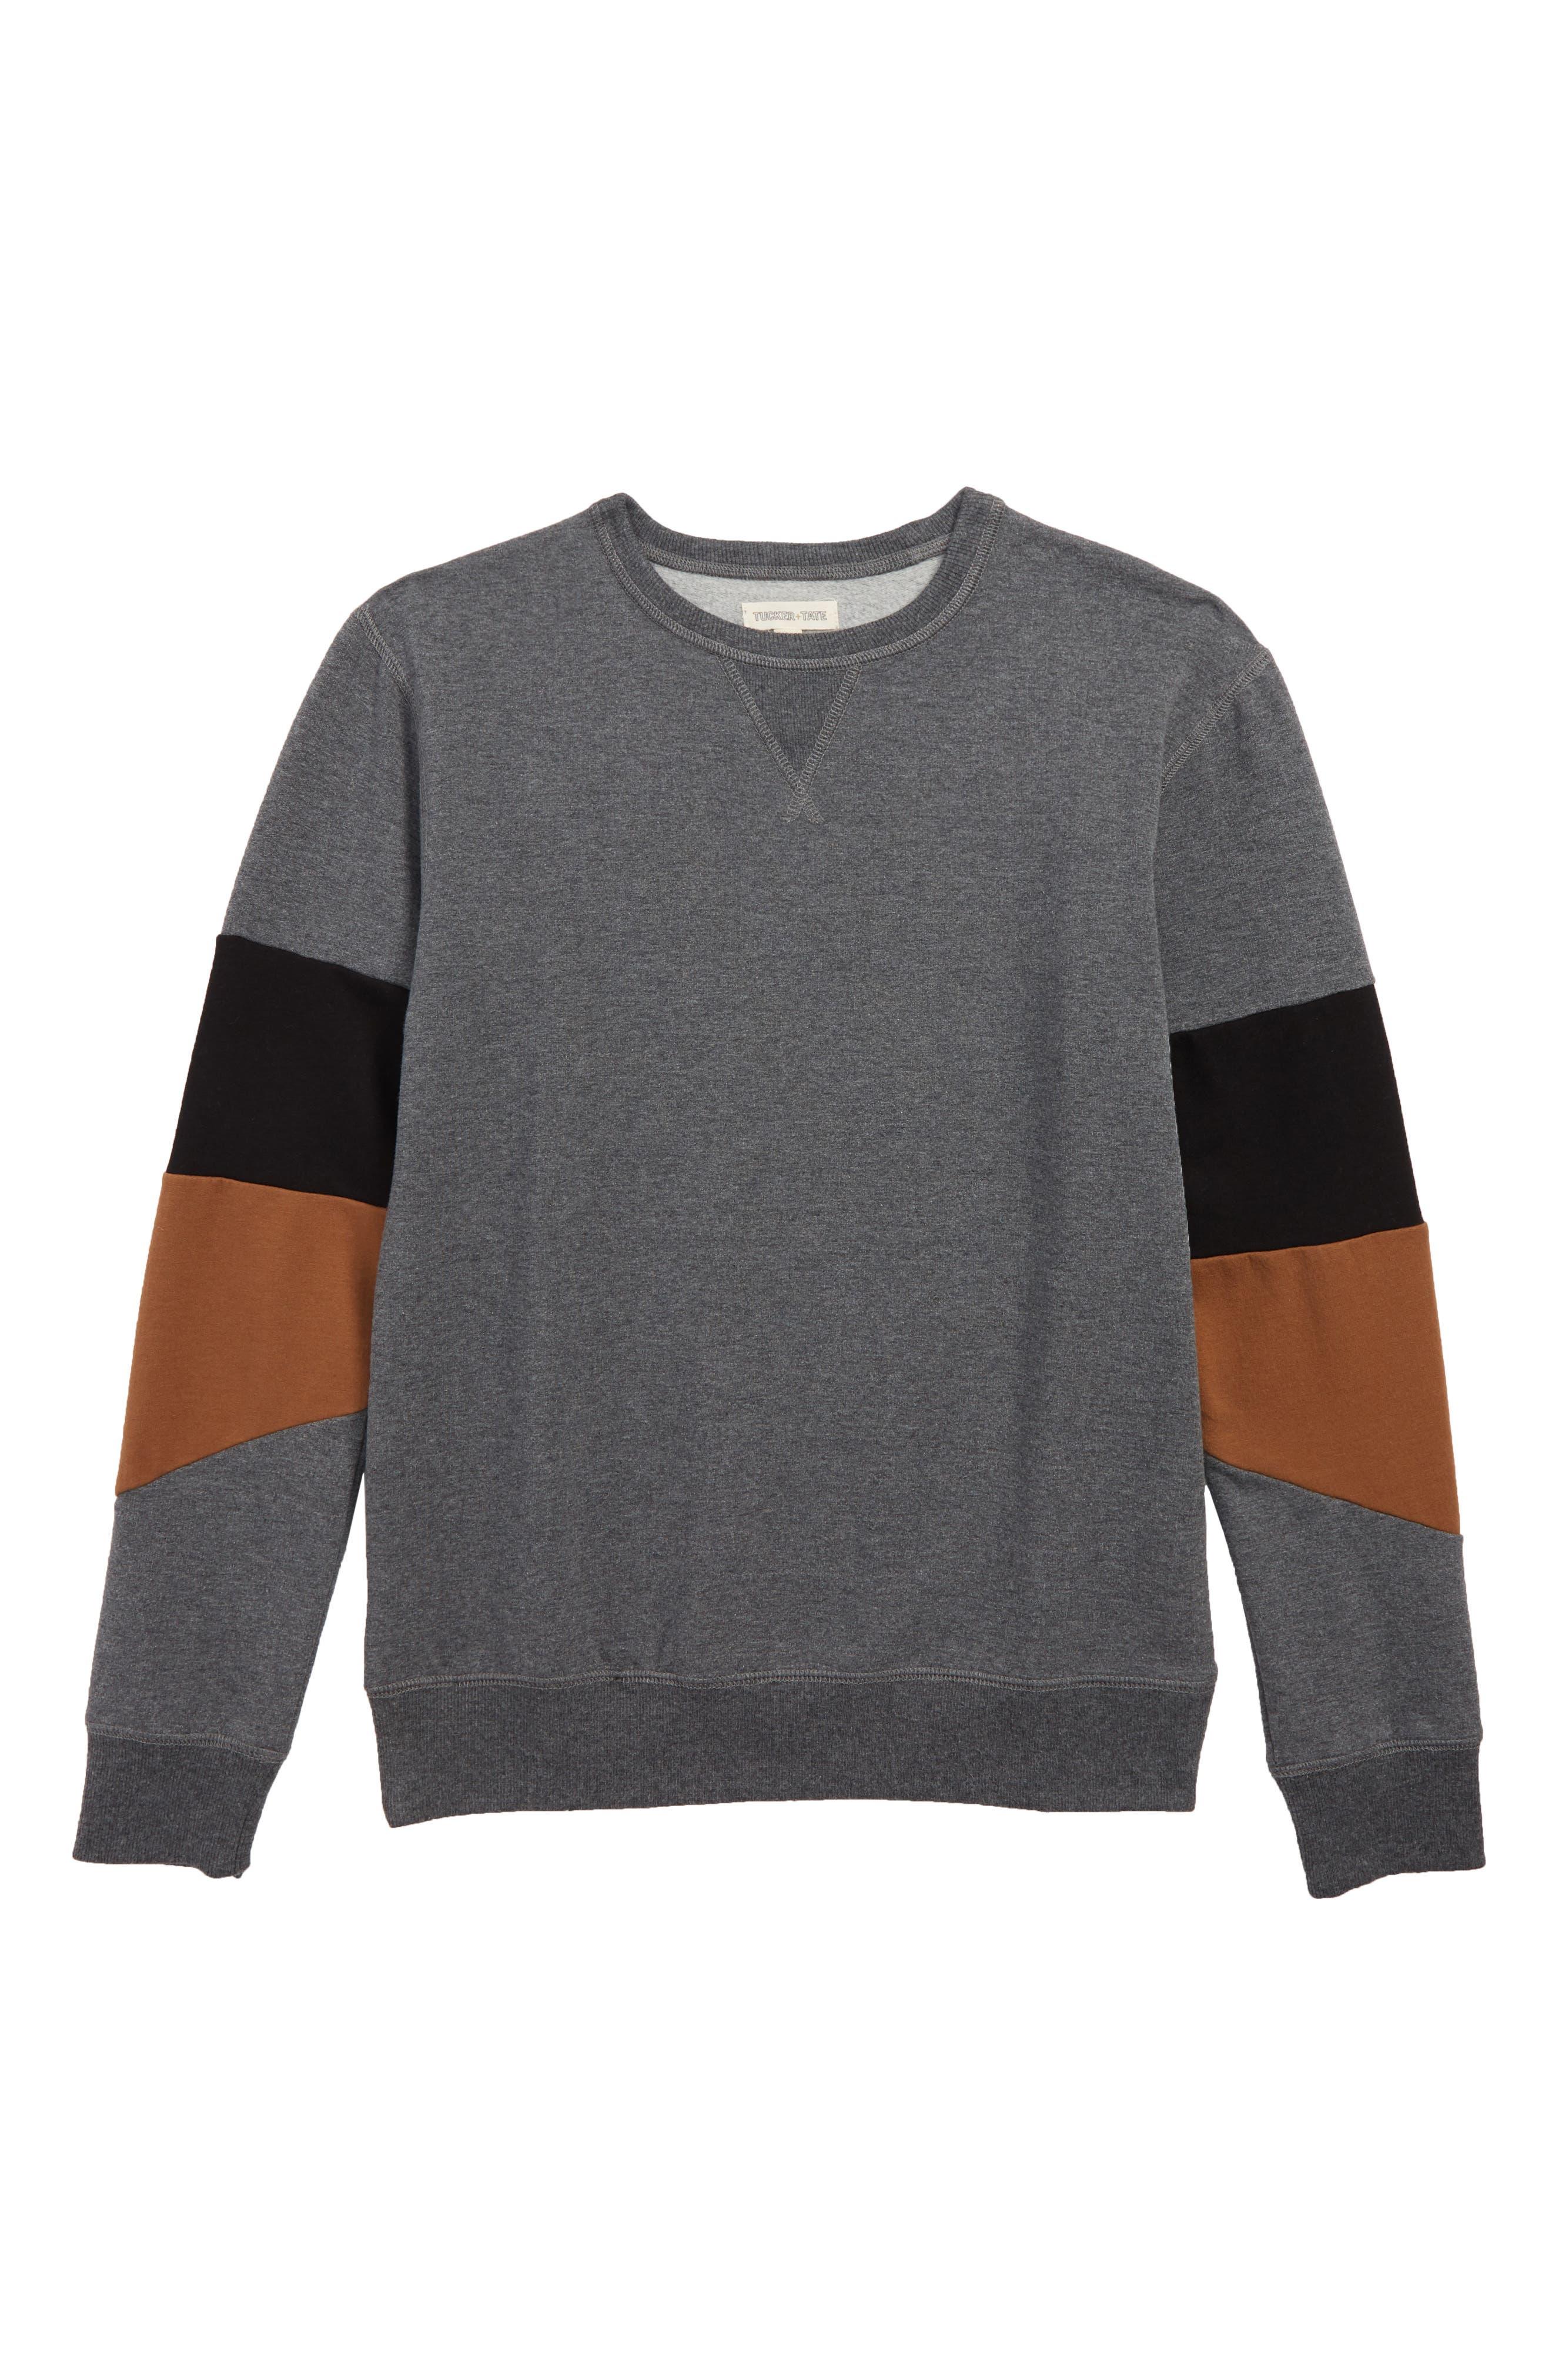 Block Sleeve Sweatshirt,                             Main thumbnail 1, color,                             030